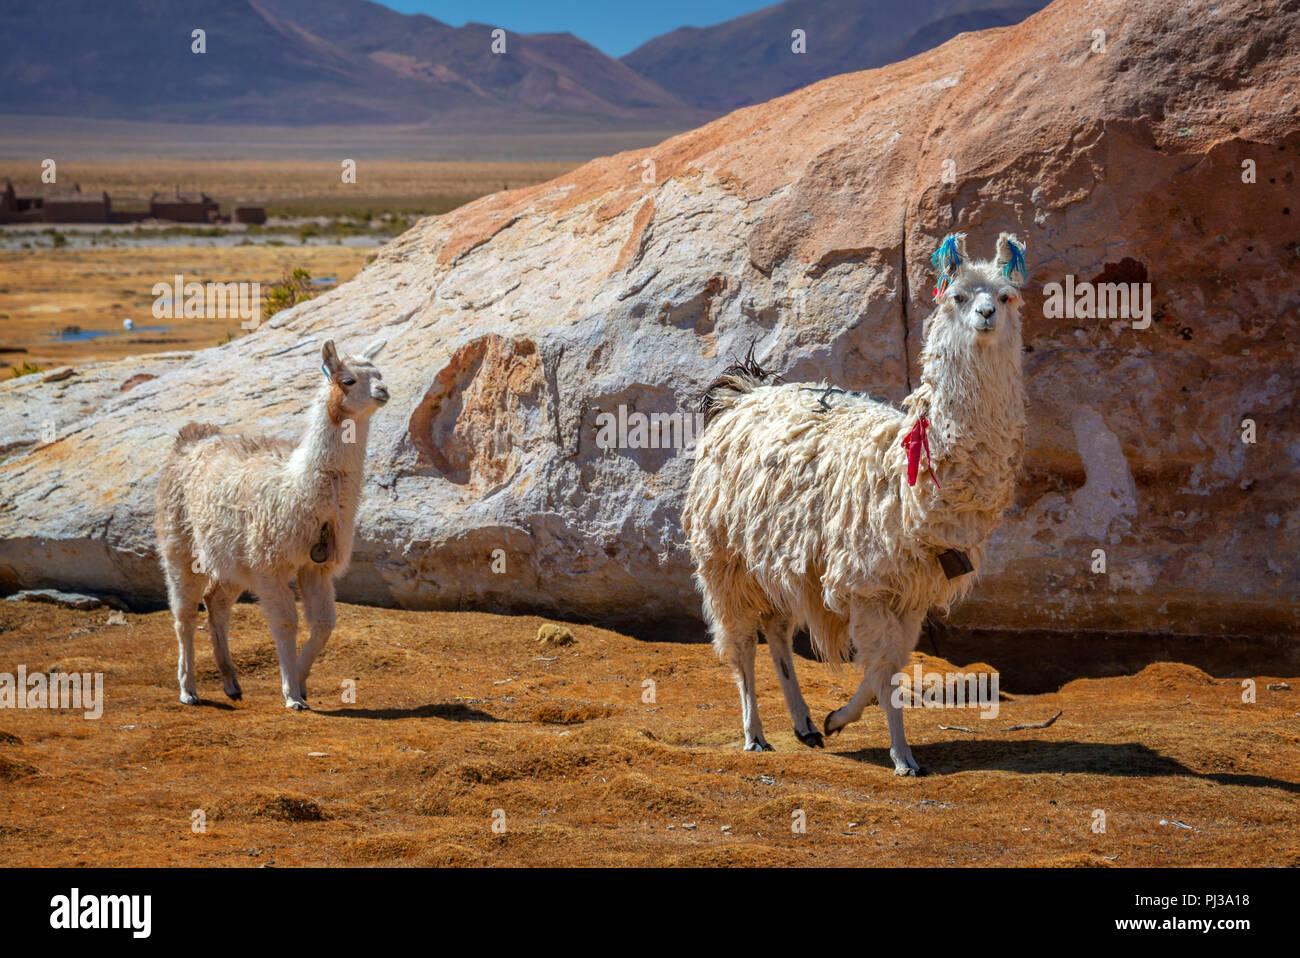 Domestic llamas grazing on the altiplano in Bolivia - Stock Image